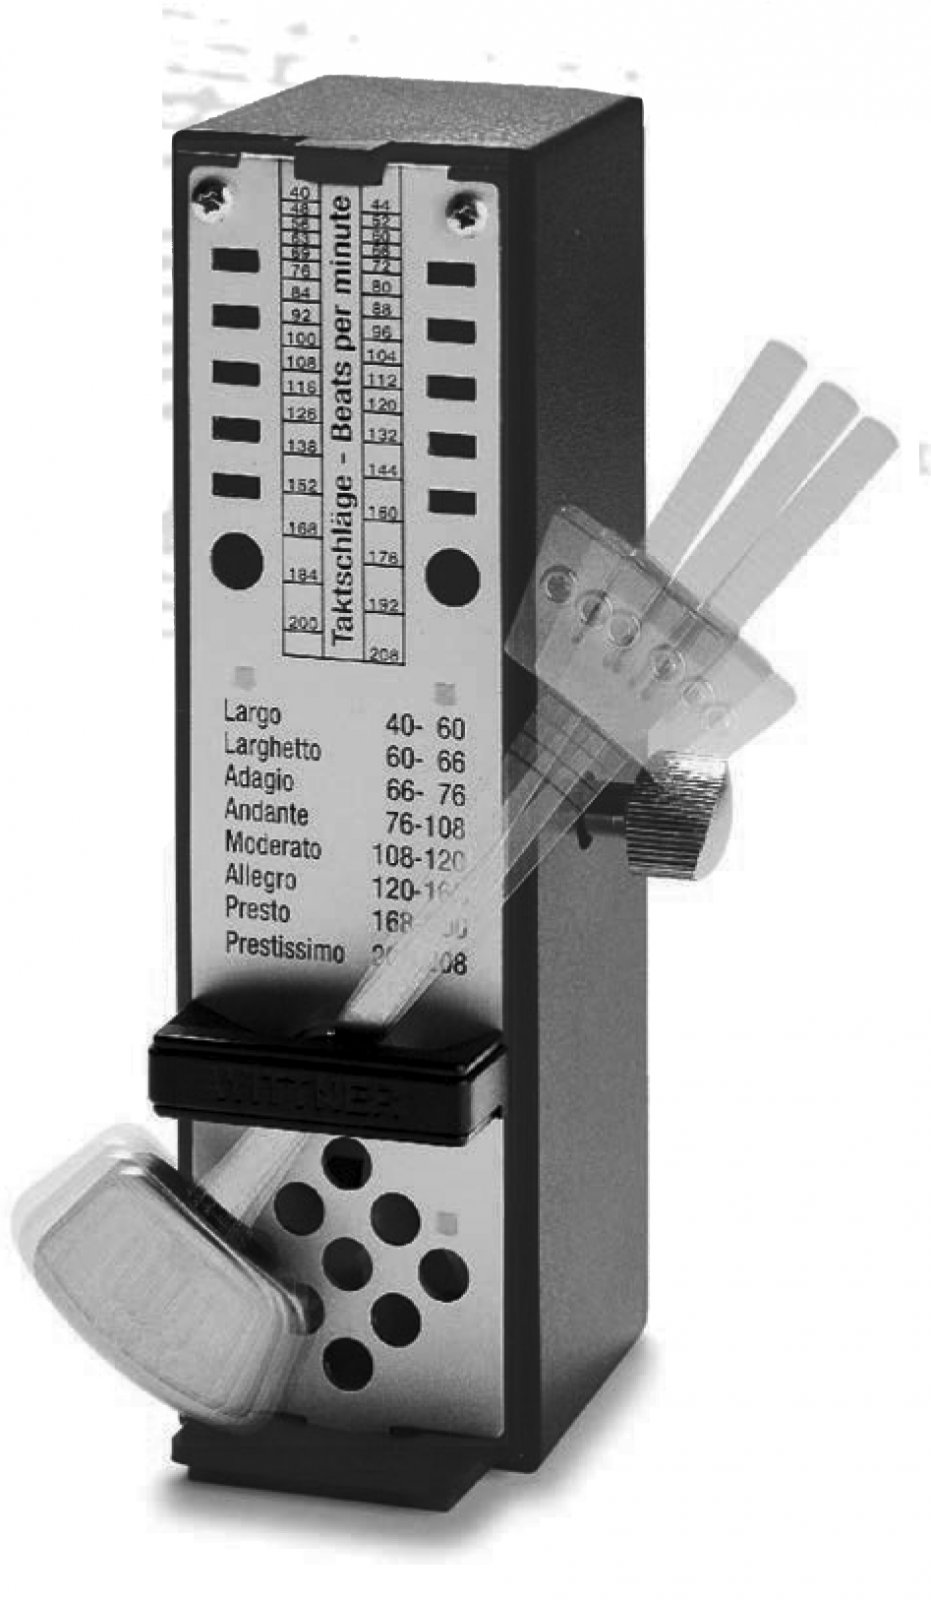 Wittner 886 Taktell Super Mini - Mini Plastic Metronome Black